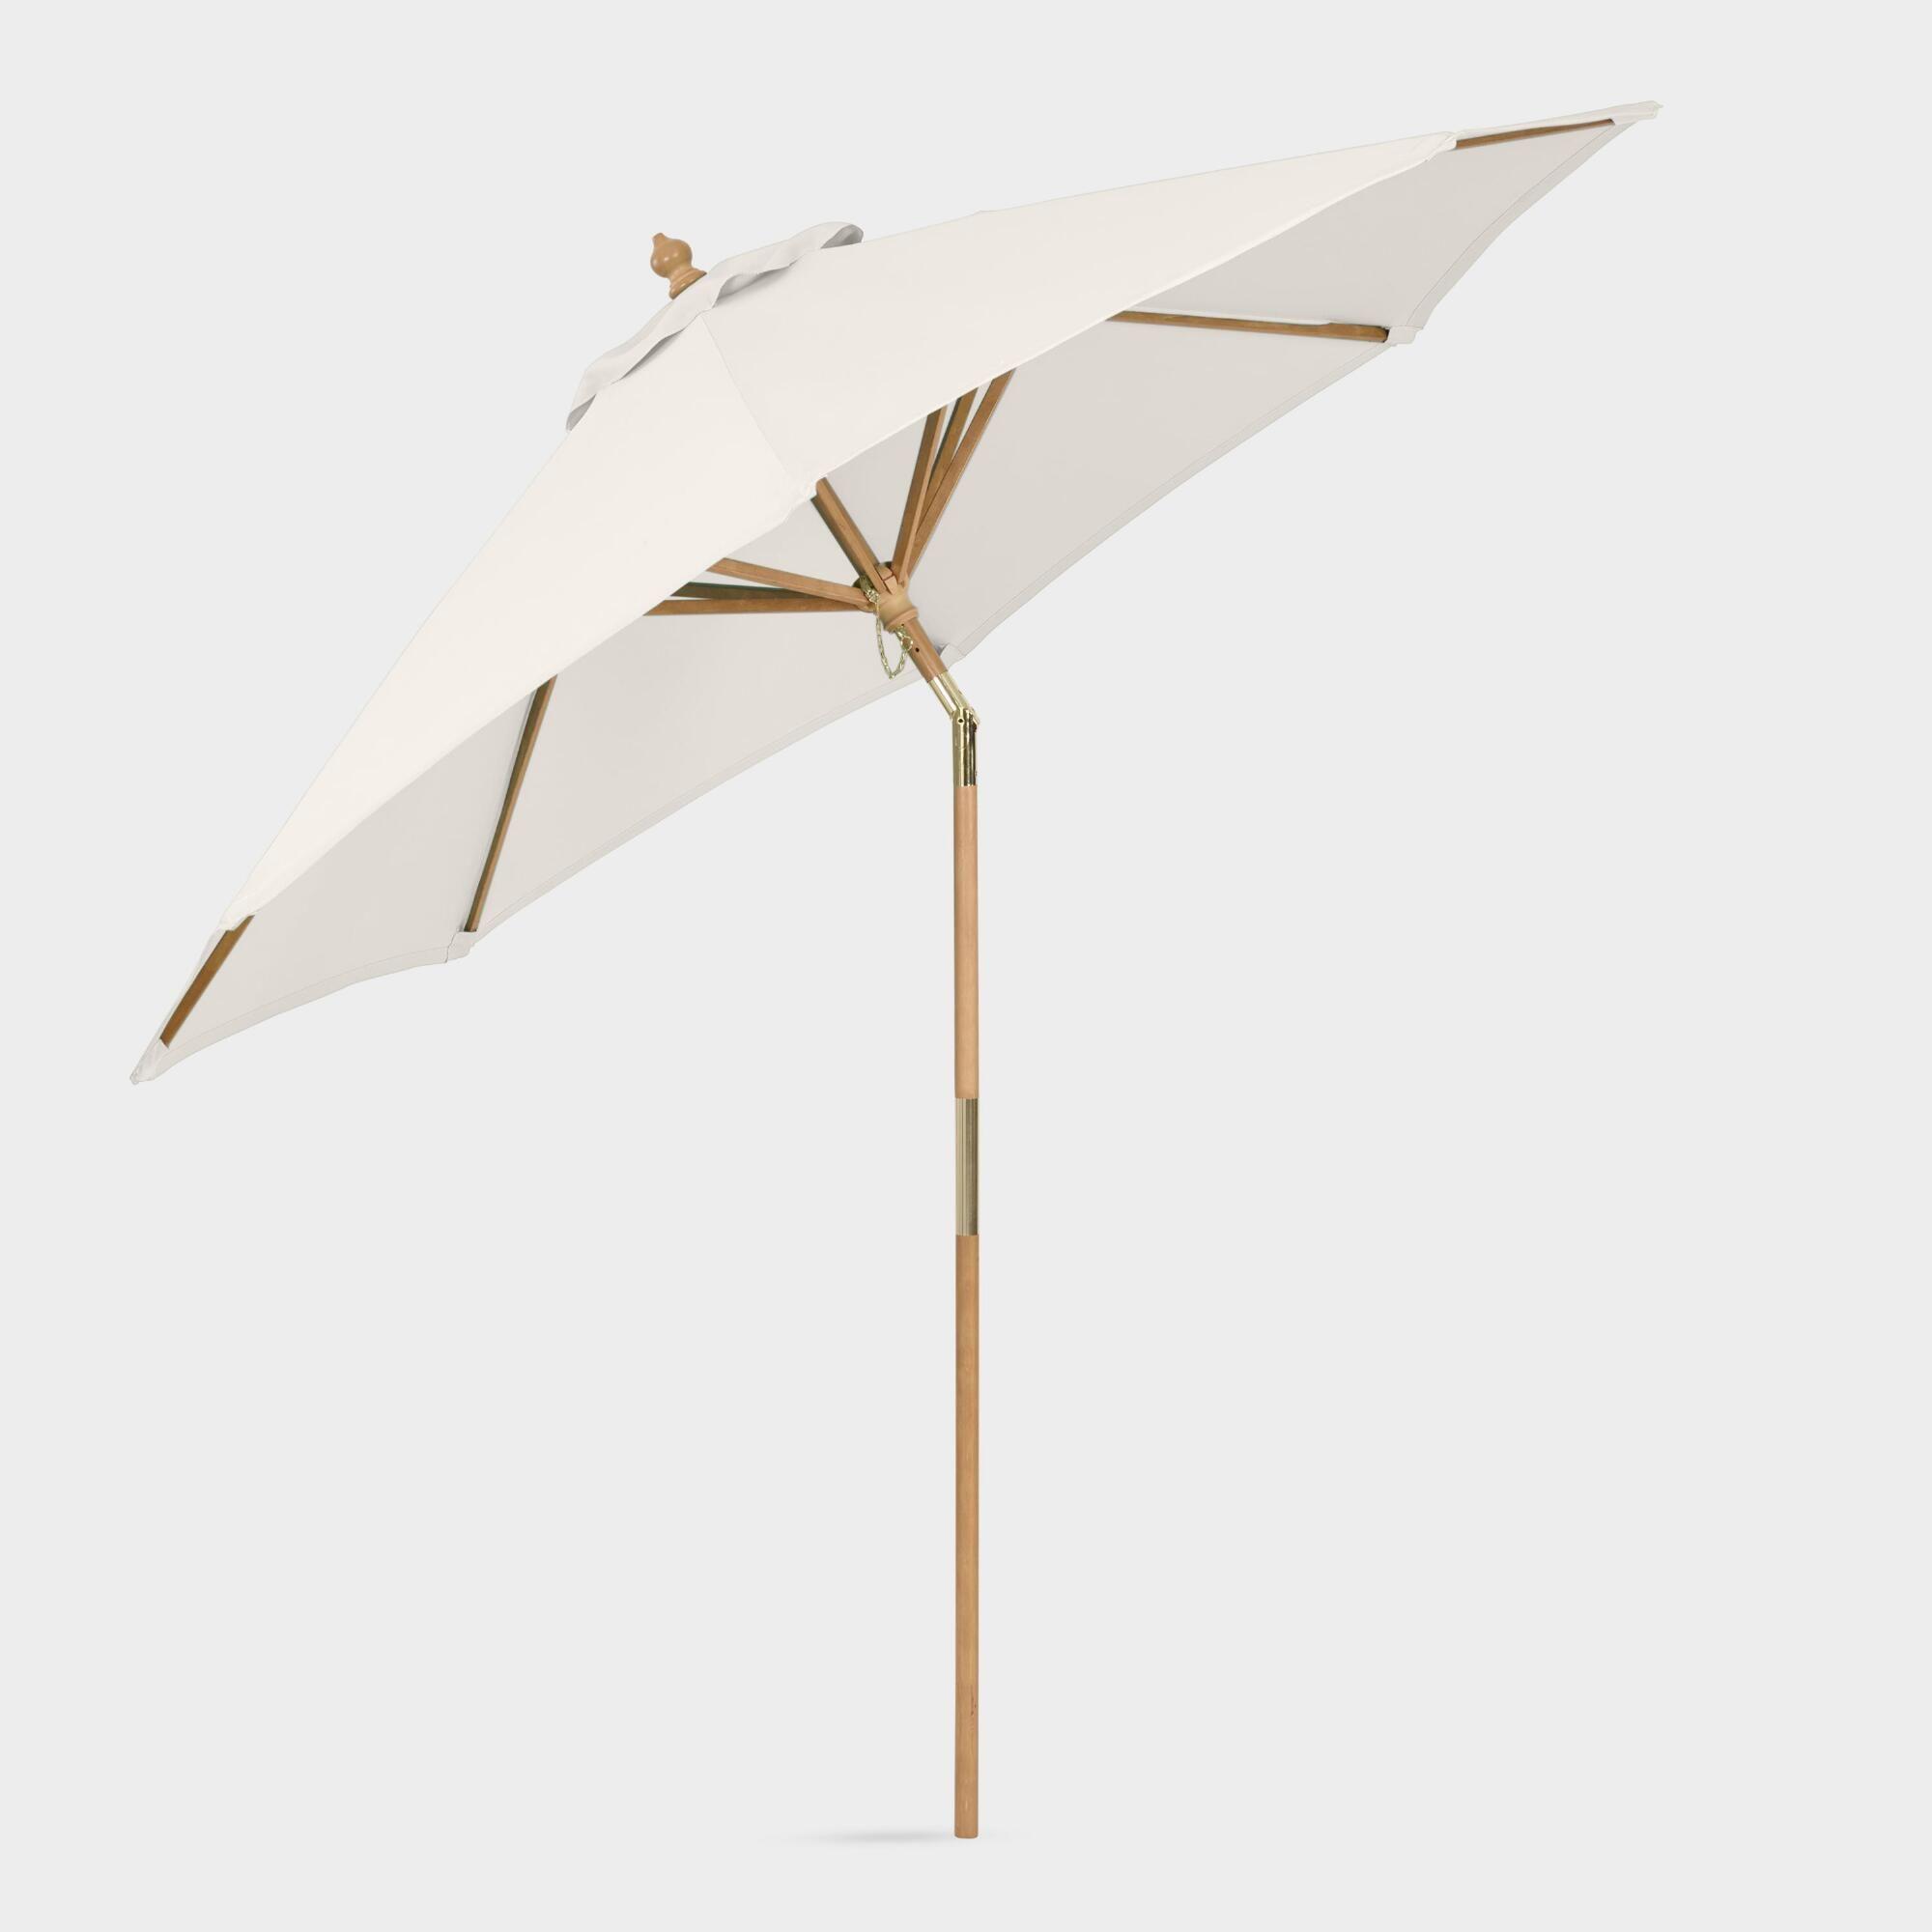 Natural Tilting 9 Ft Outdoor Patio Umbrella Frame And Pole